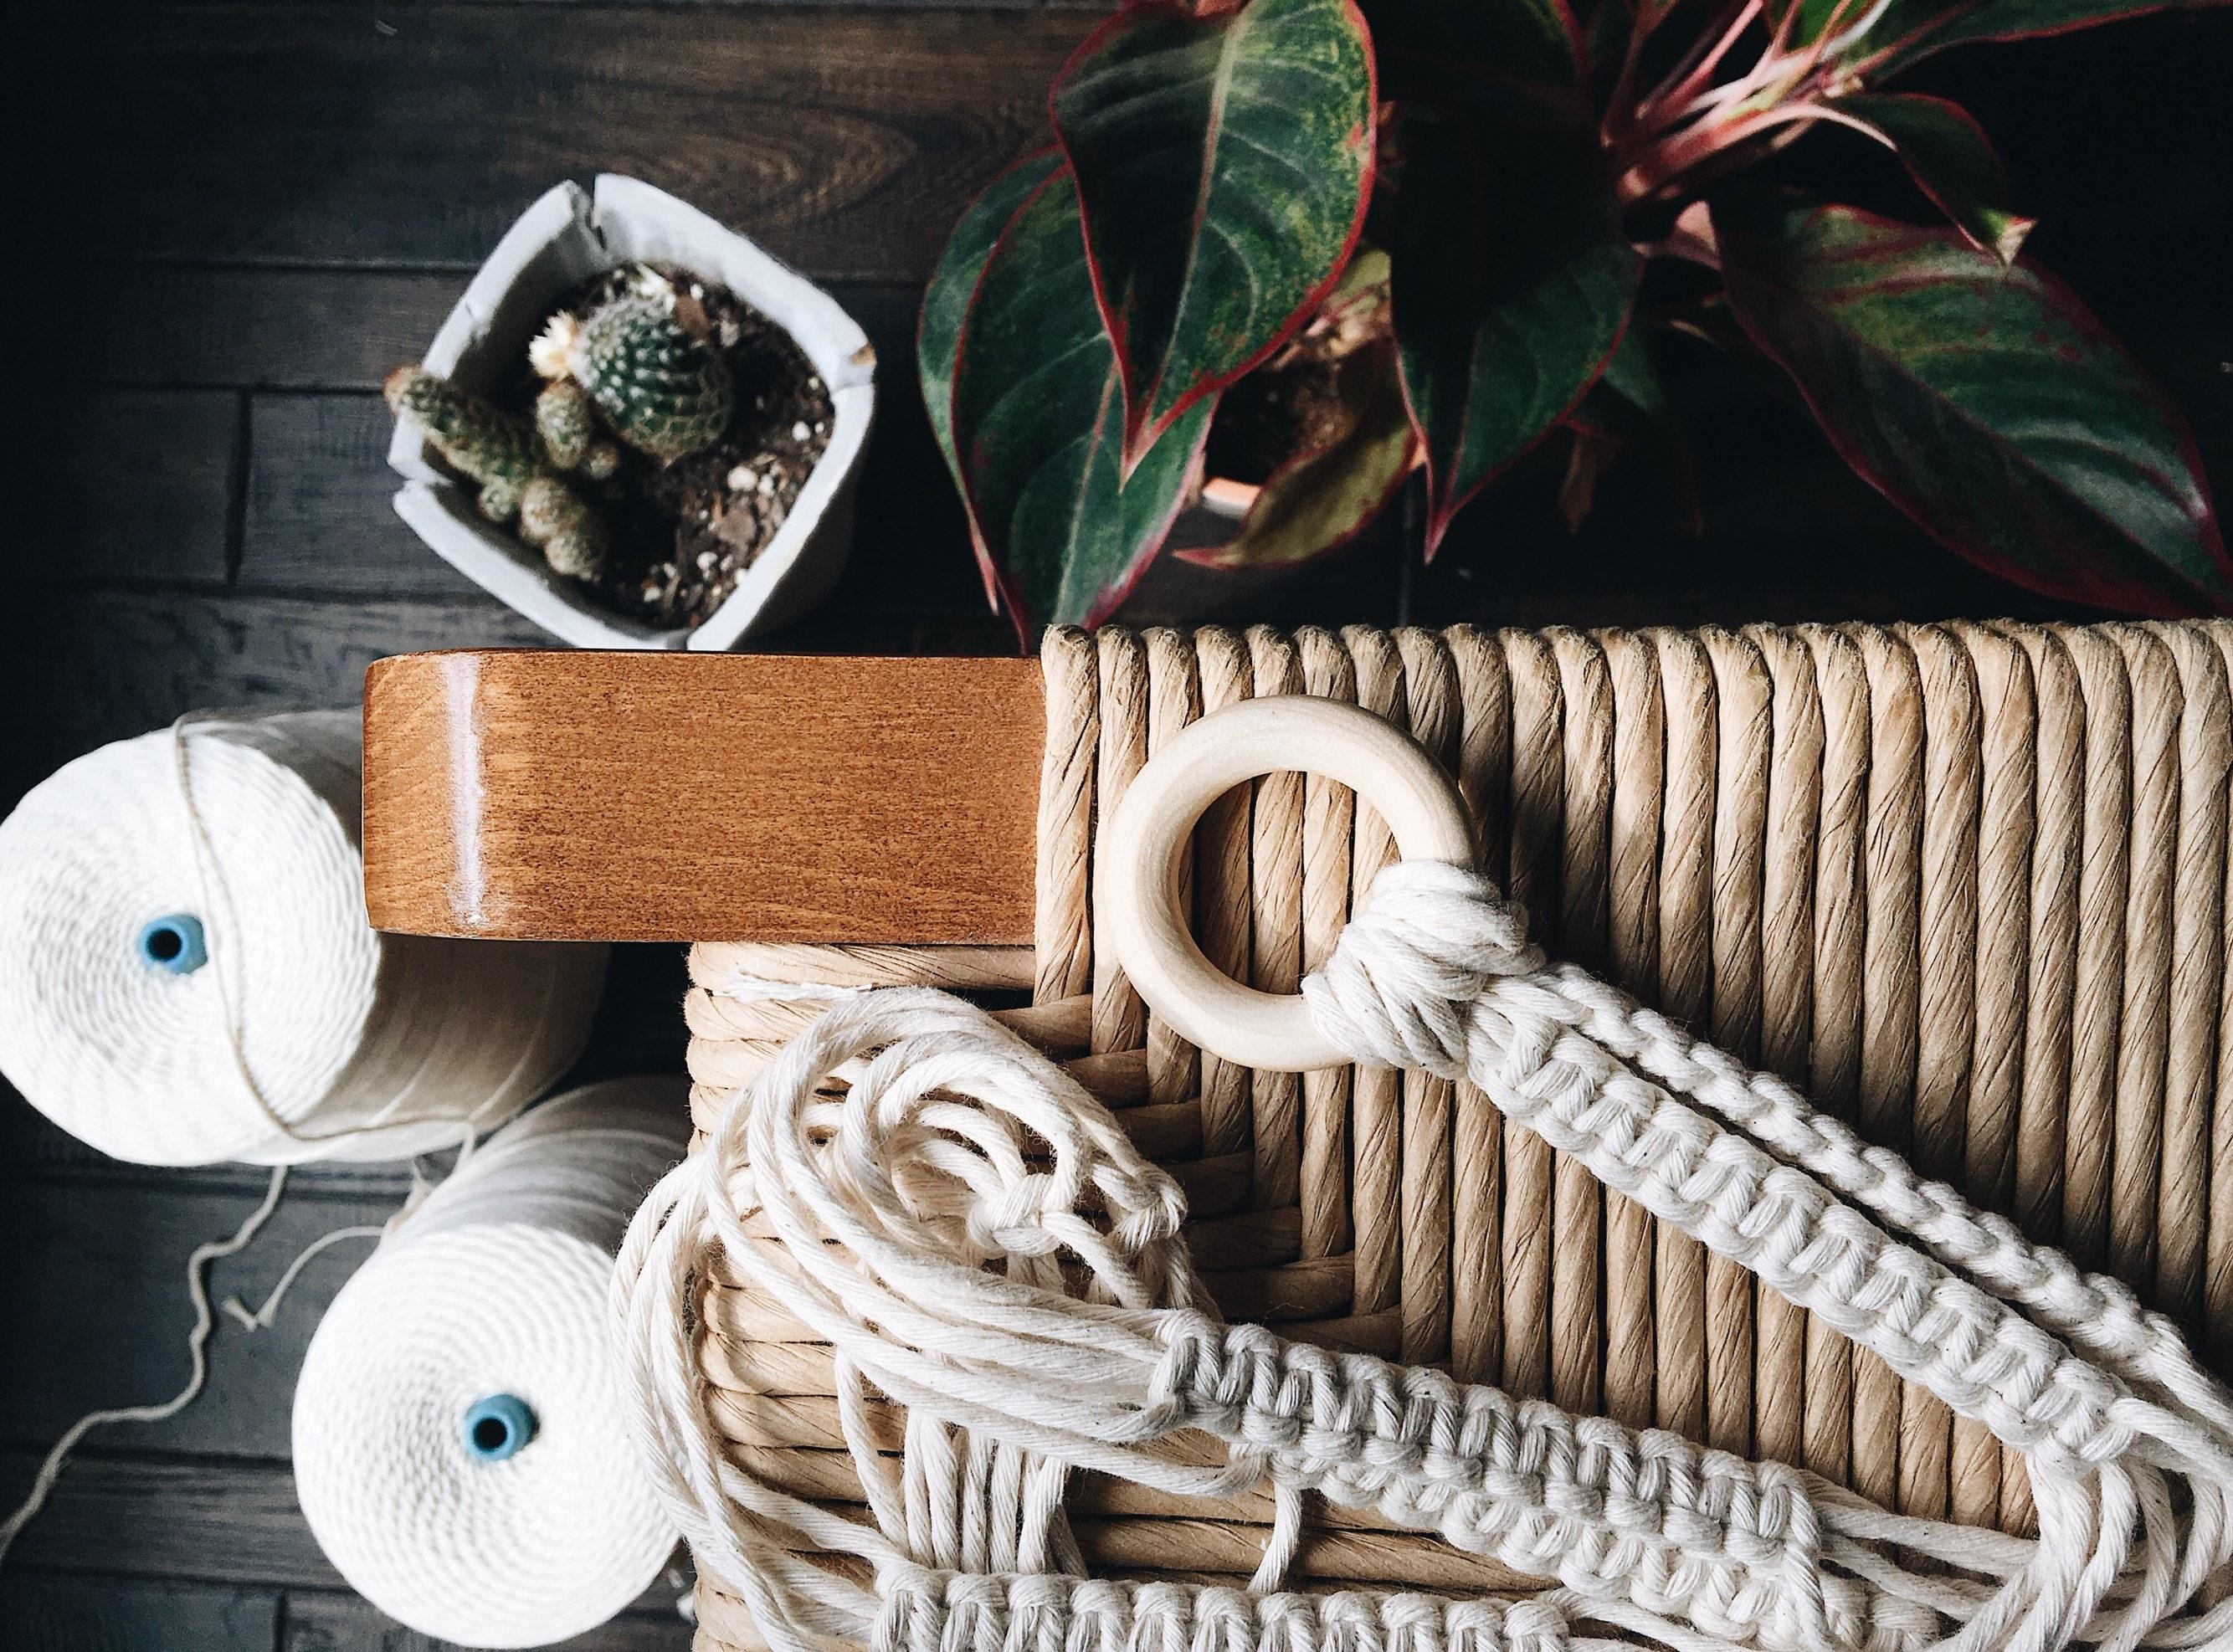 Diy Macrame Plant Hanger Kit Craft Box Boho Style